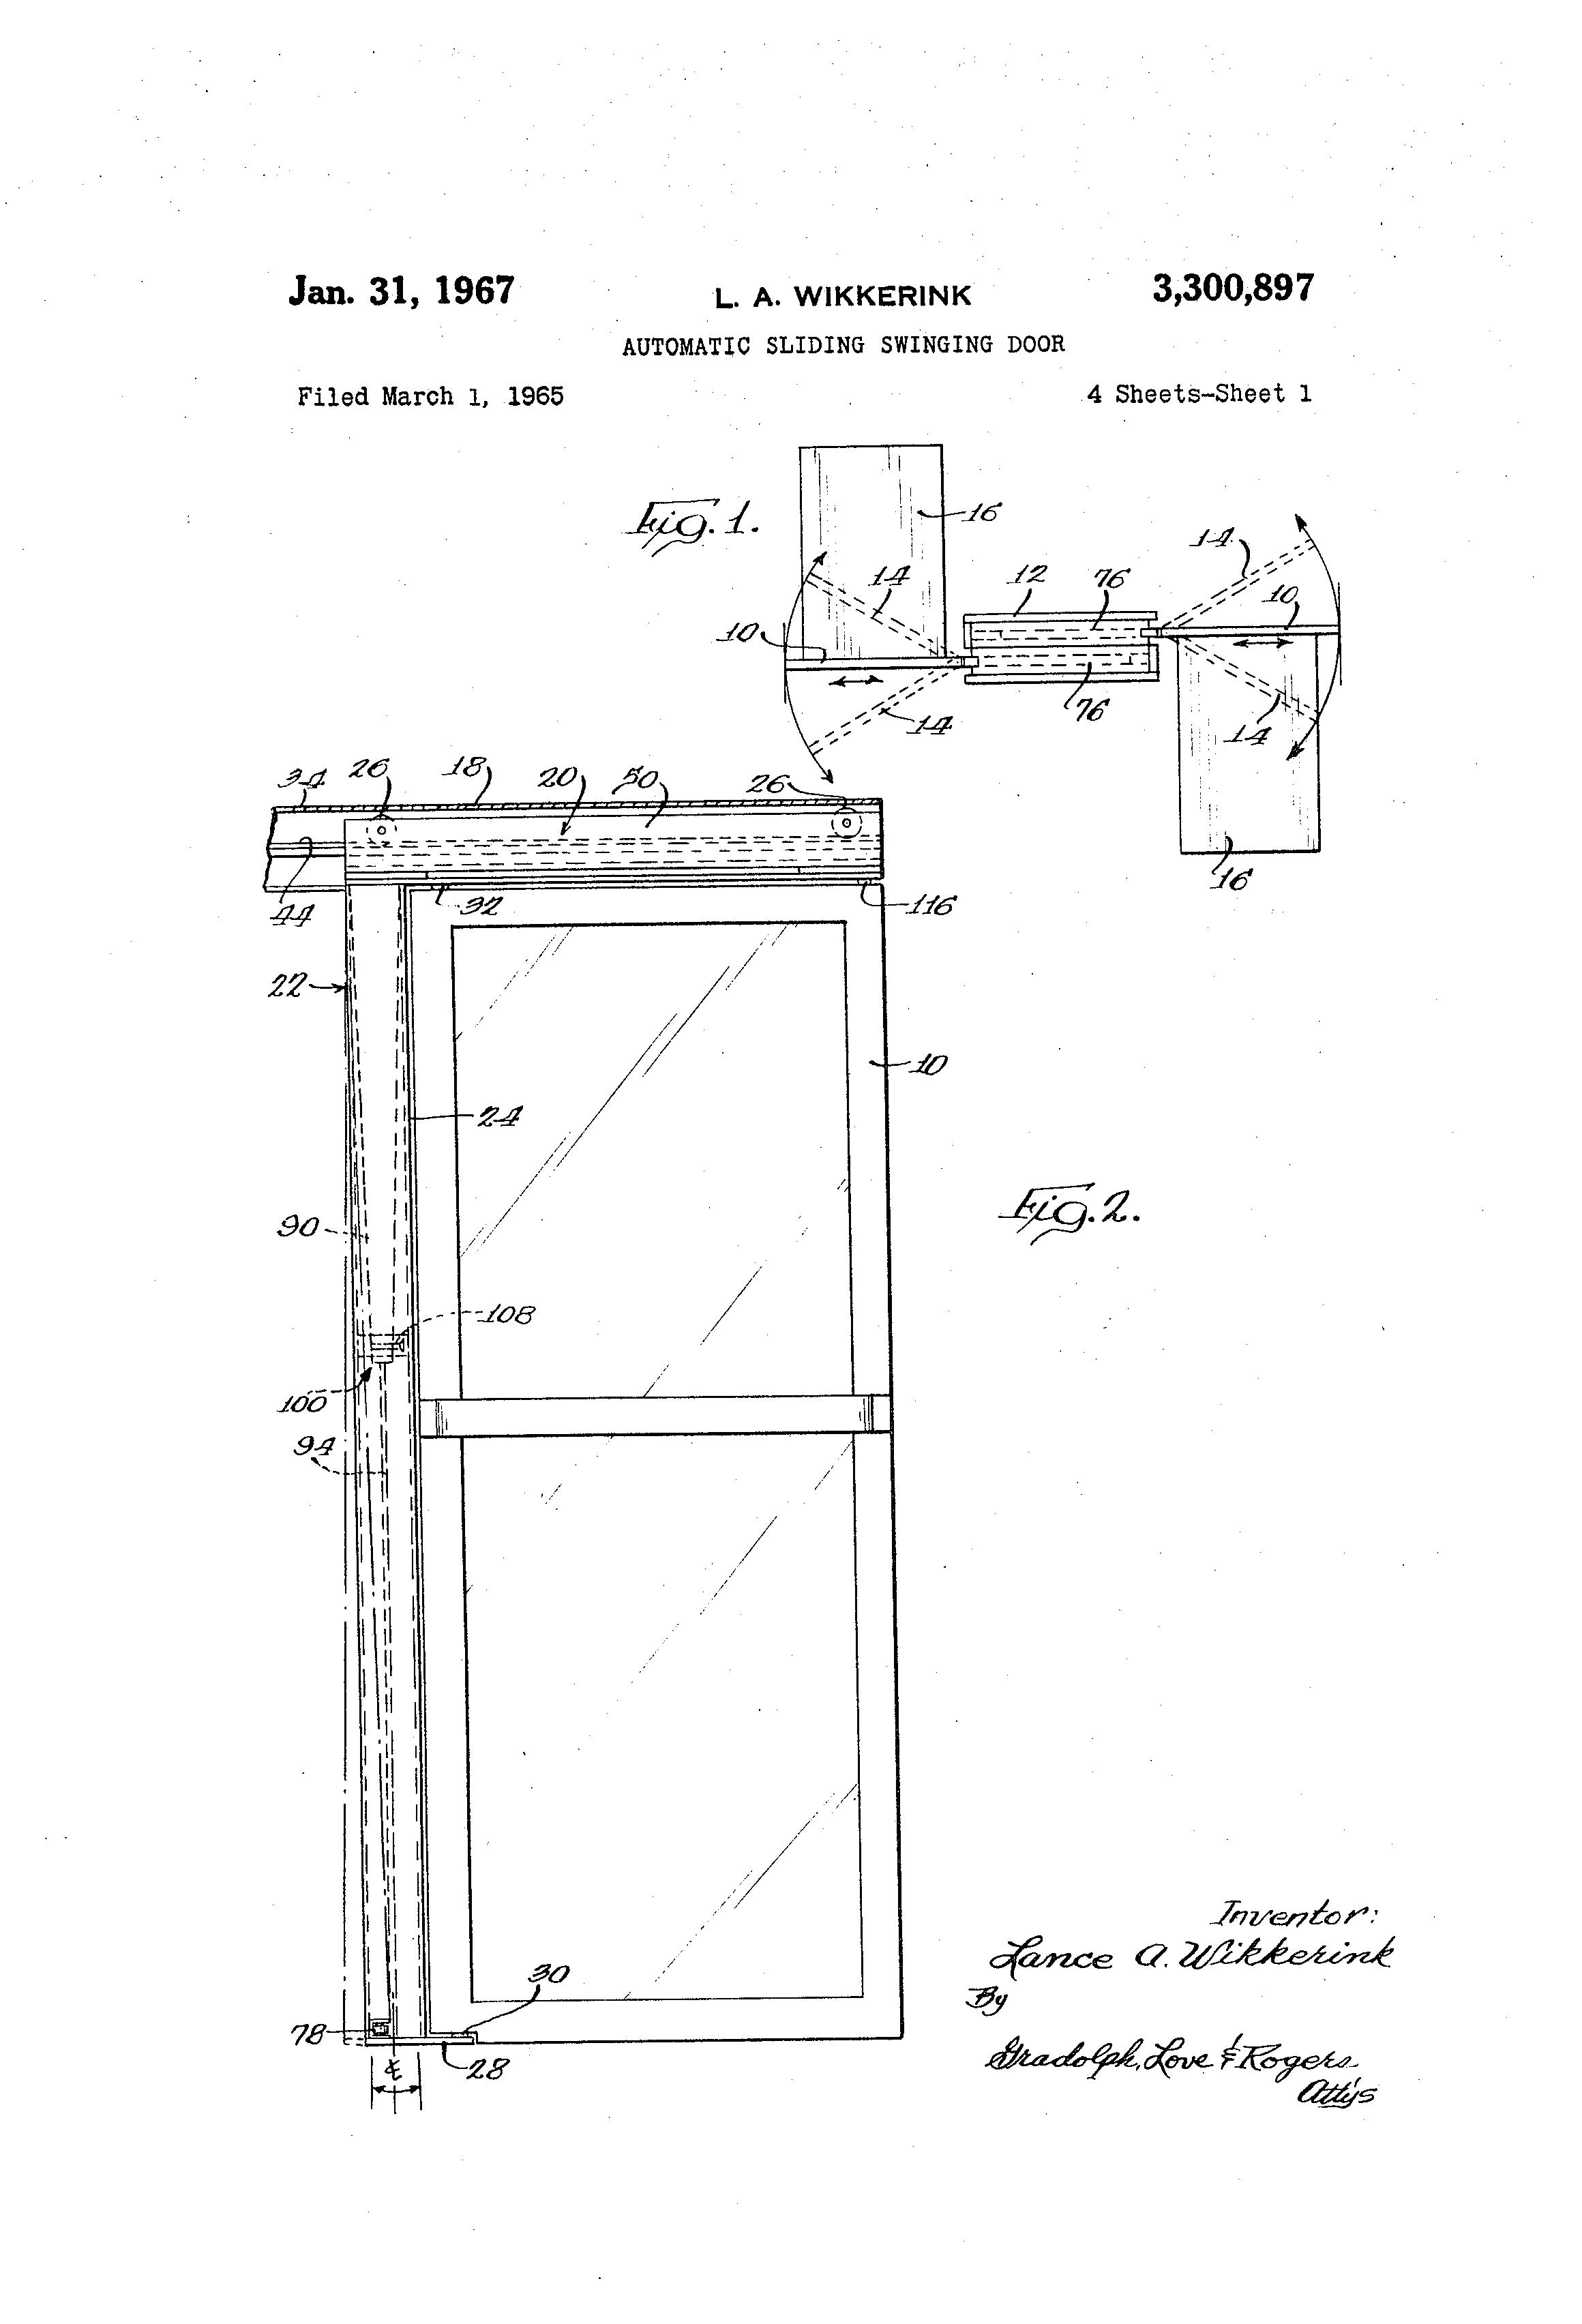 Horton Door Parts Amp Circuit Diagram Maker Online Amusing